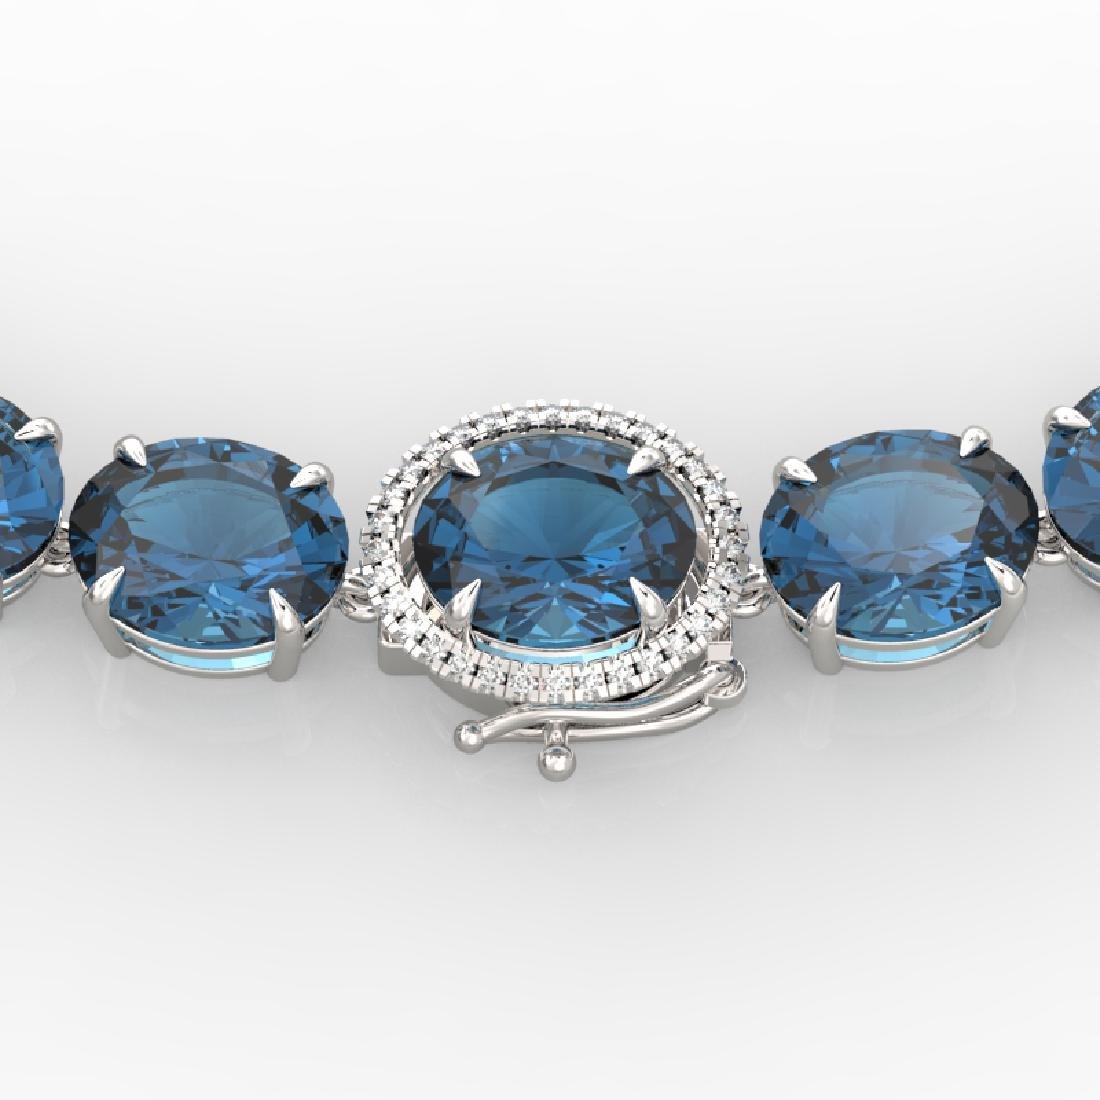 177 CTW London Blue Topaz & VS/SI Diamond Halo Micro